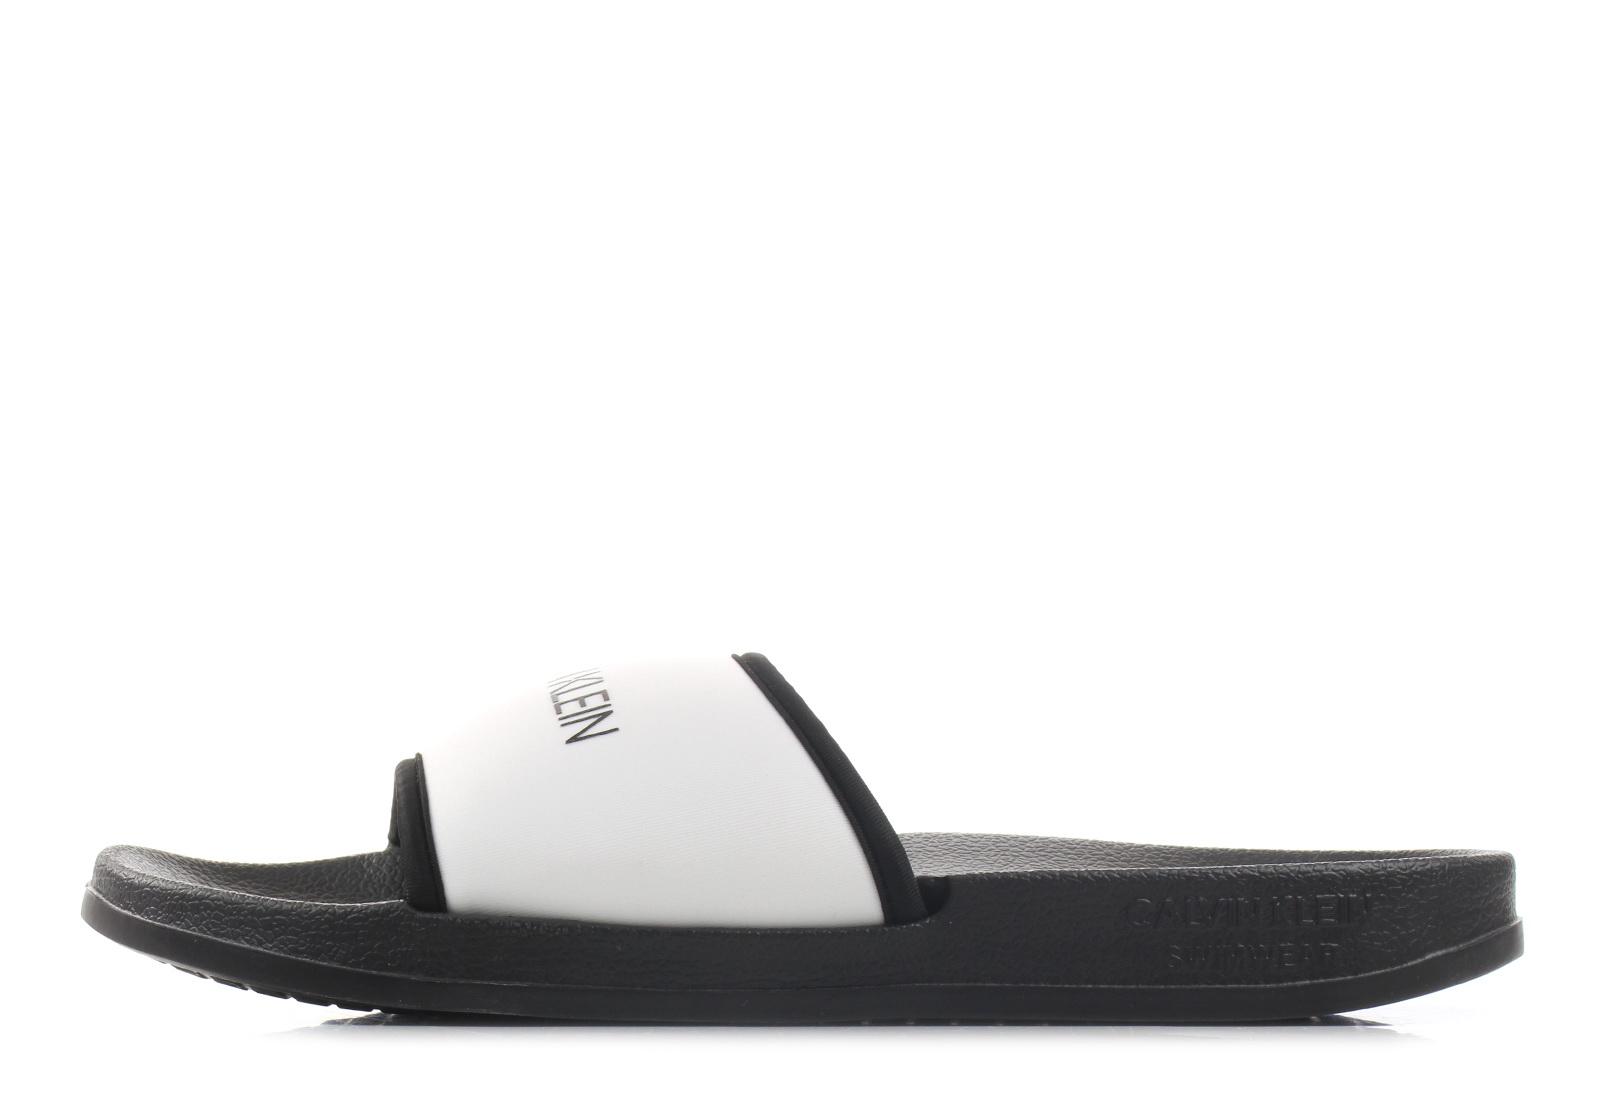 ac09f1bc15 Calvin Klein Swimwear Papucs - Core Neo Plus - KW00780-100 - Office ...